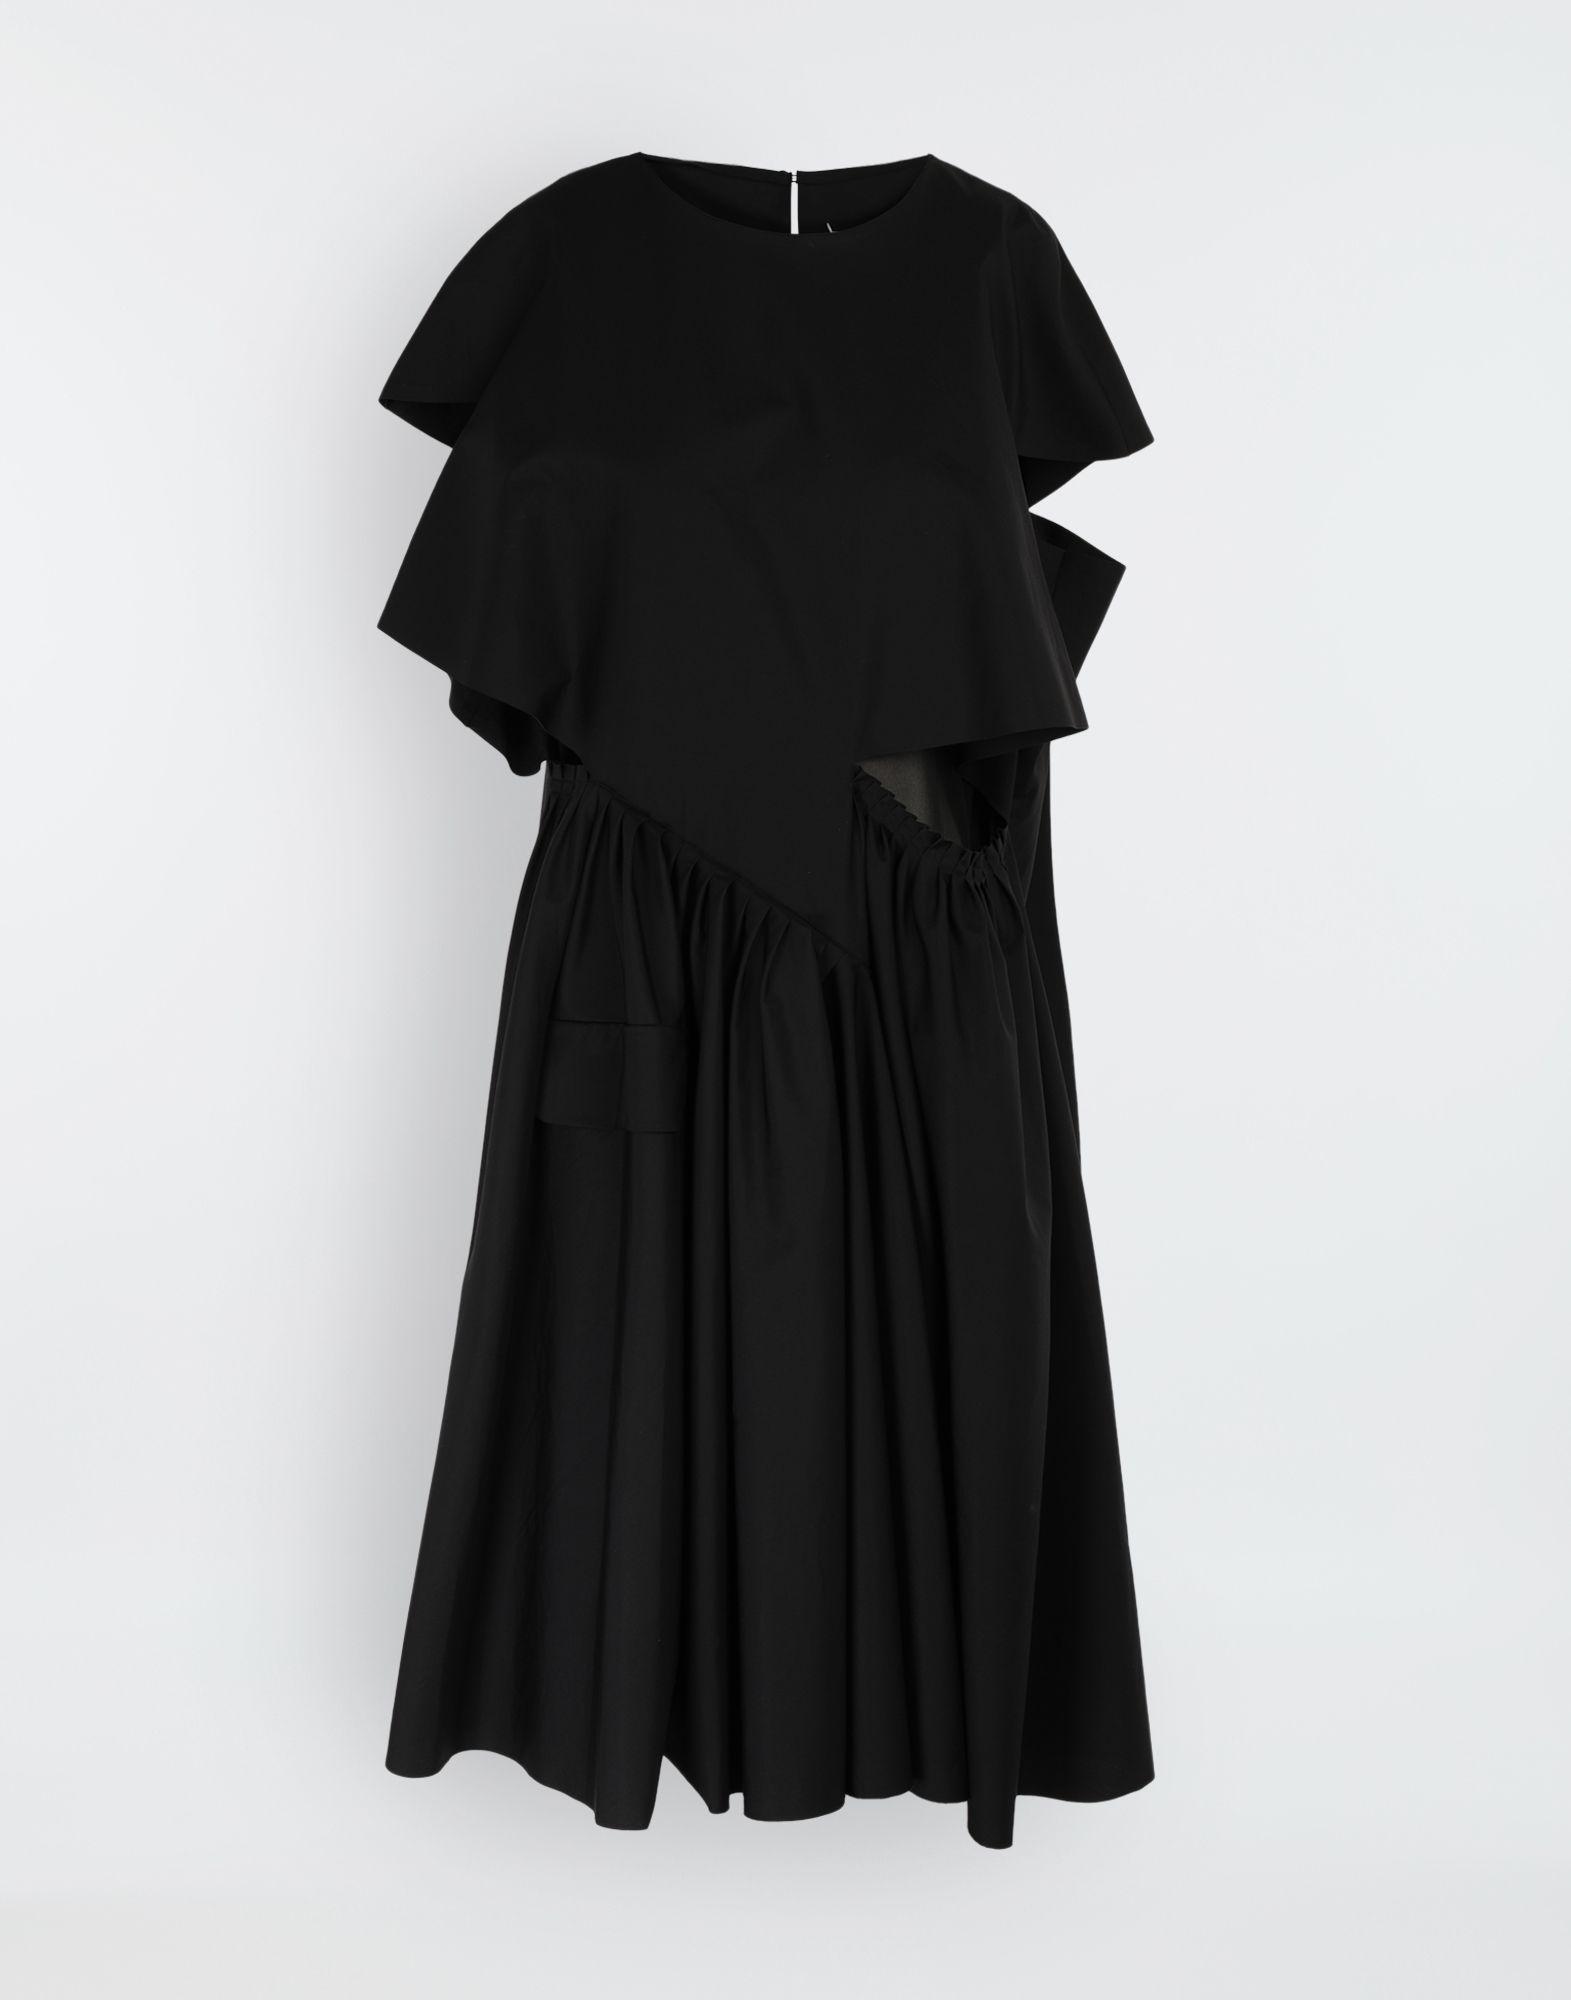 MAISON MARGIELA Décortiqué gathered midi dress 3/4 length dress Woman f